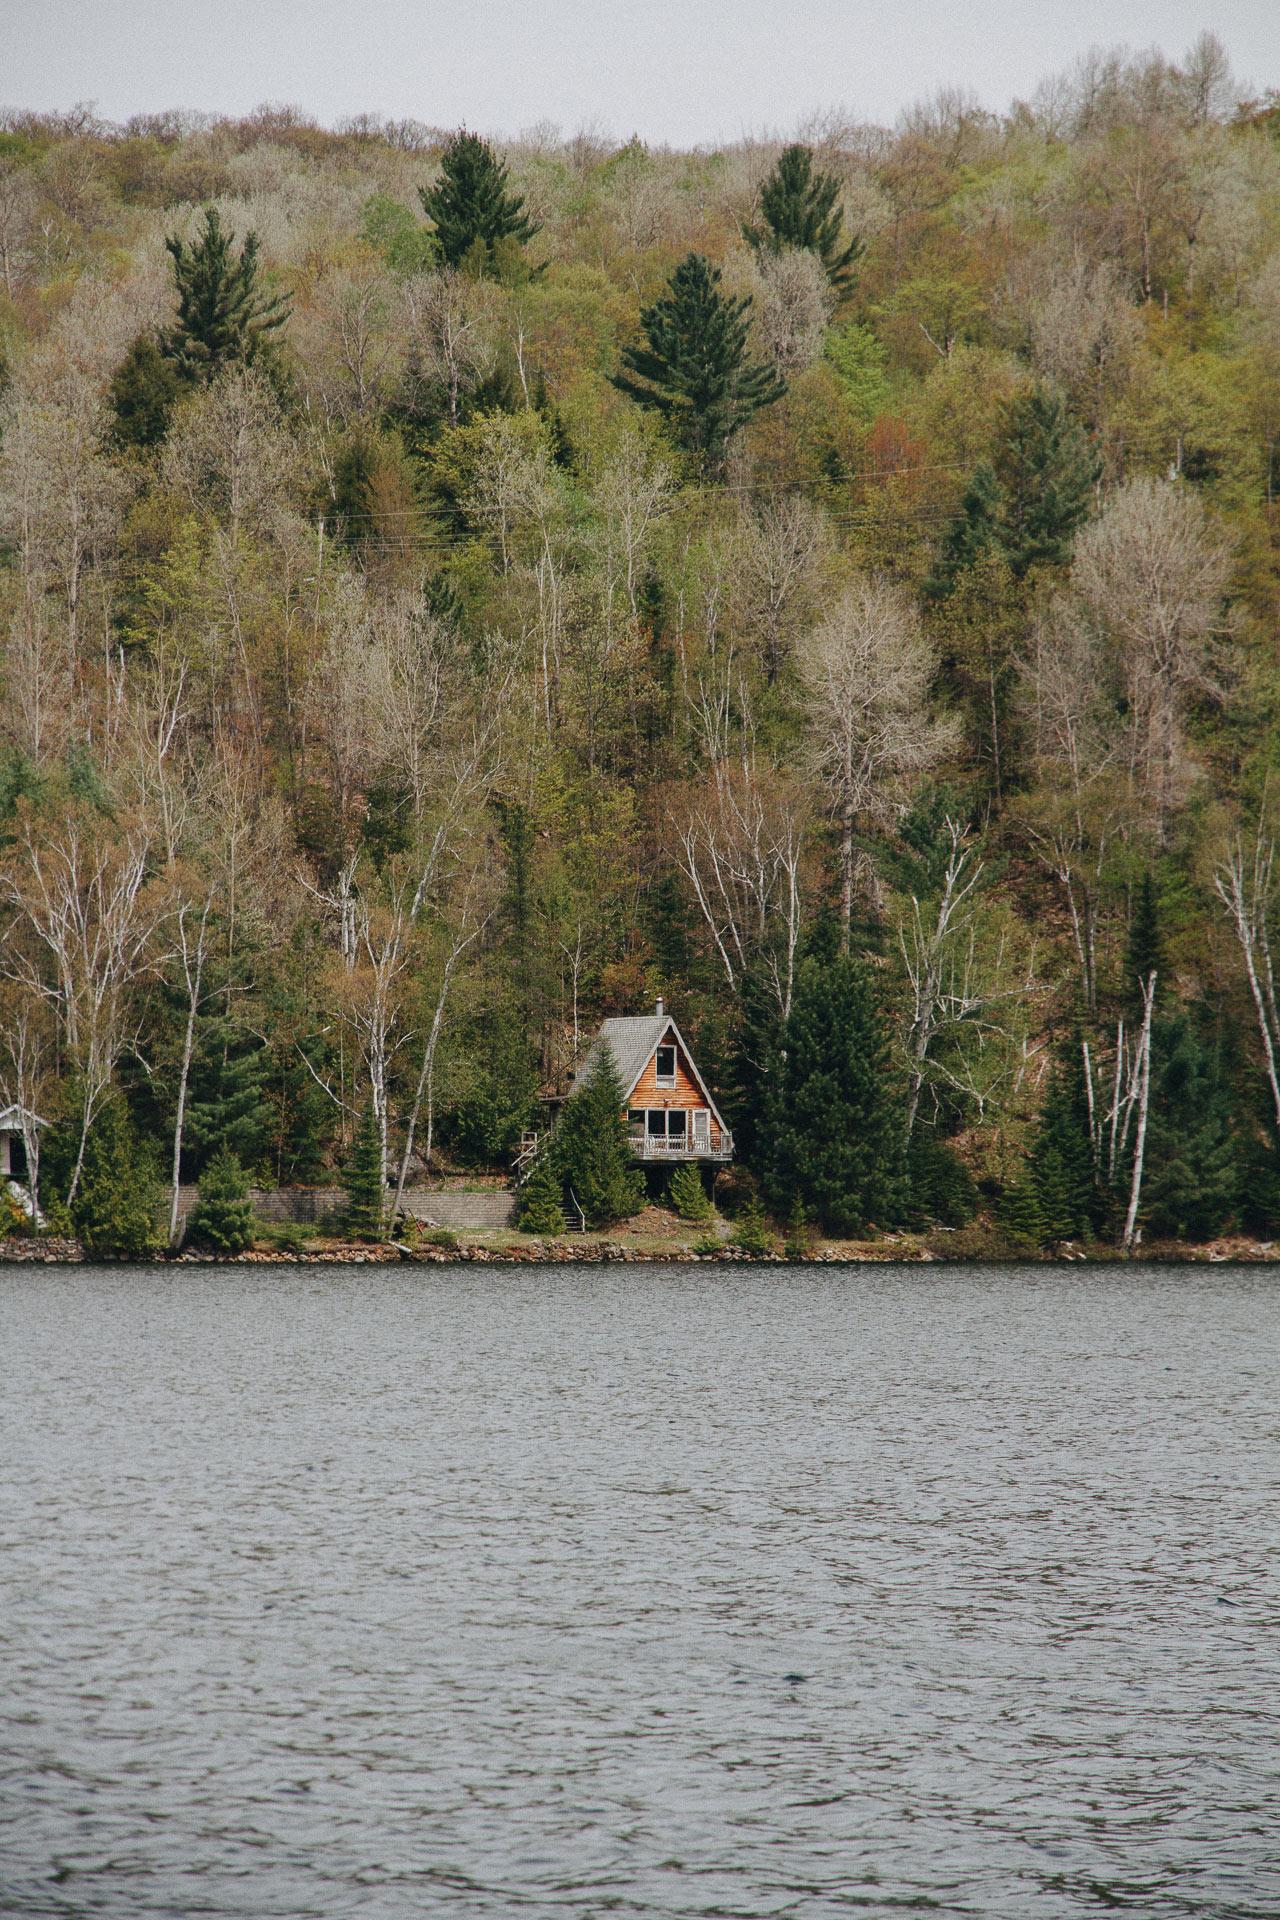 chalet_ford_explorer_cabin_life_cabin_lust_wander_explore_canada_quebecoriginal